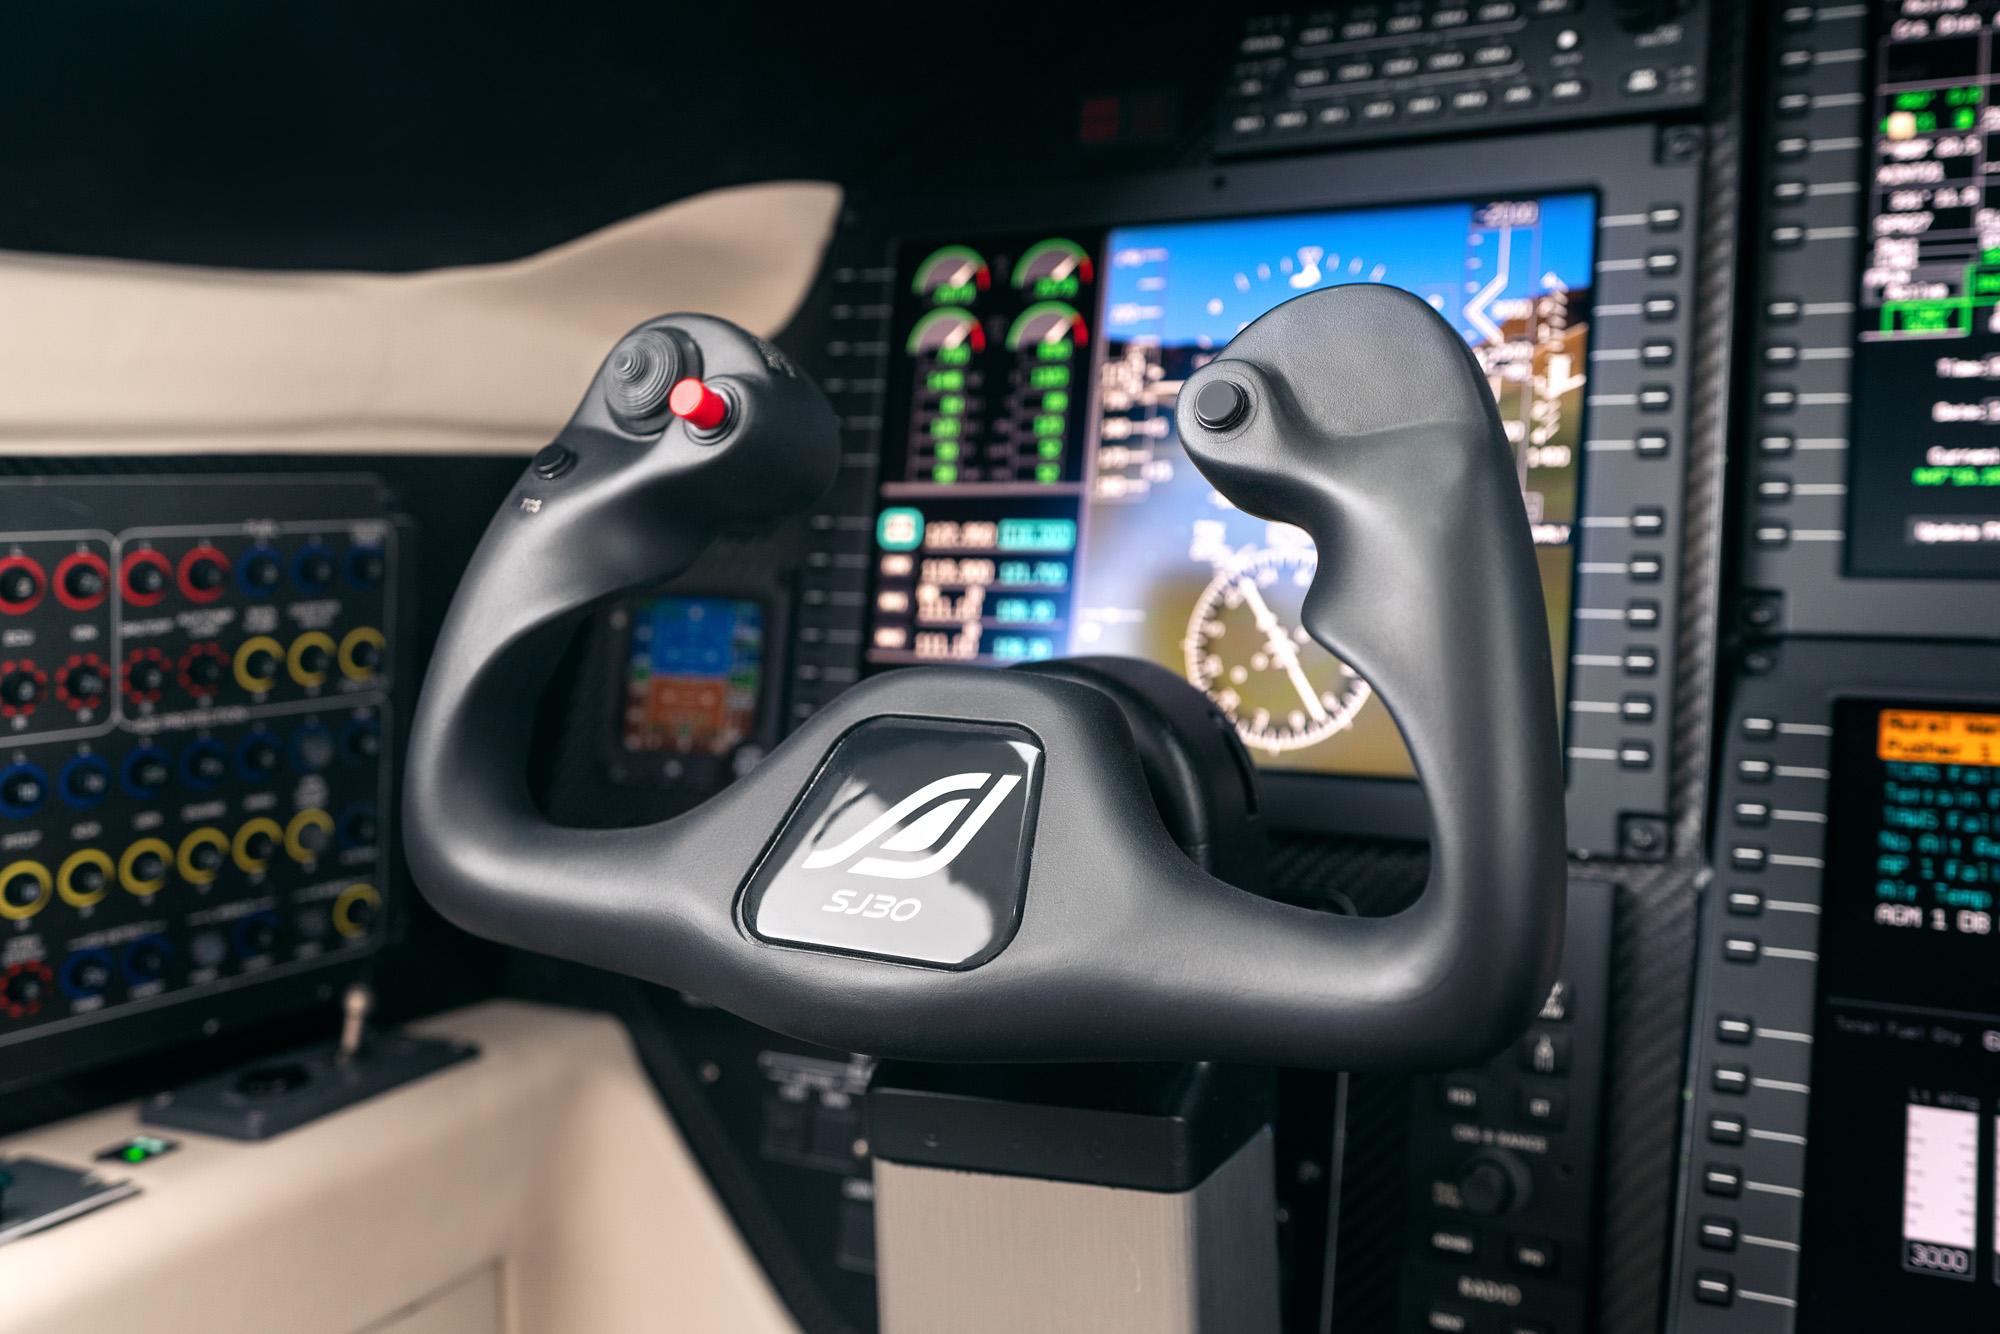 Cockpit Interior - Syberjet